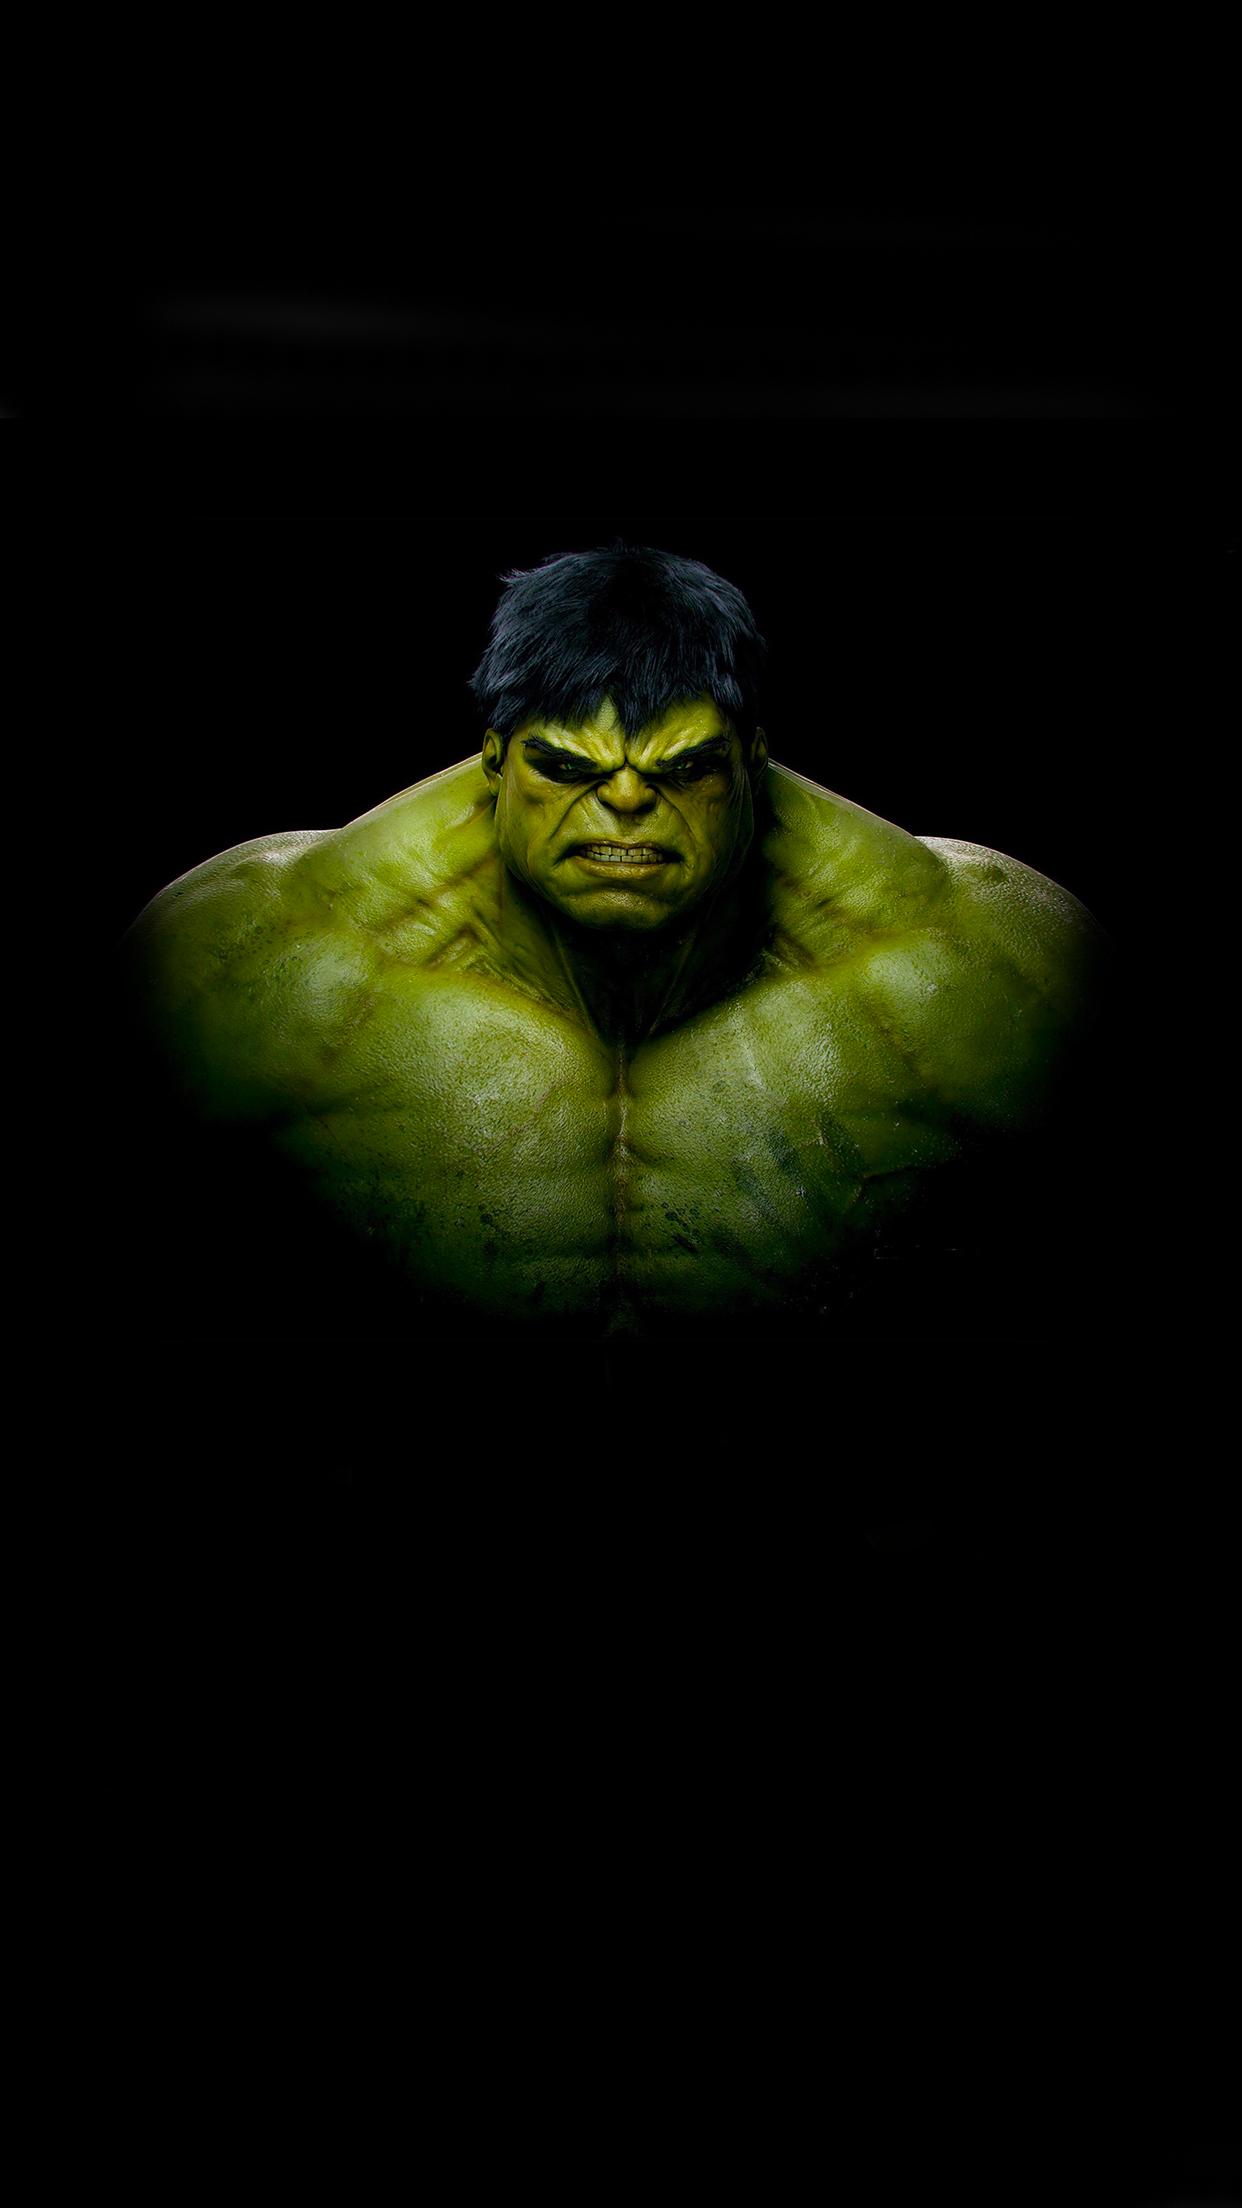 hulk black wallpaper for iphone x 8 7 6 free download